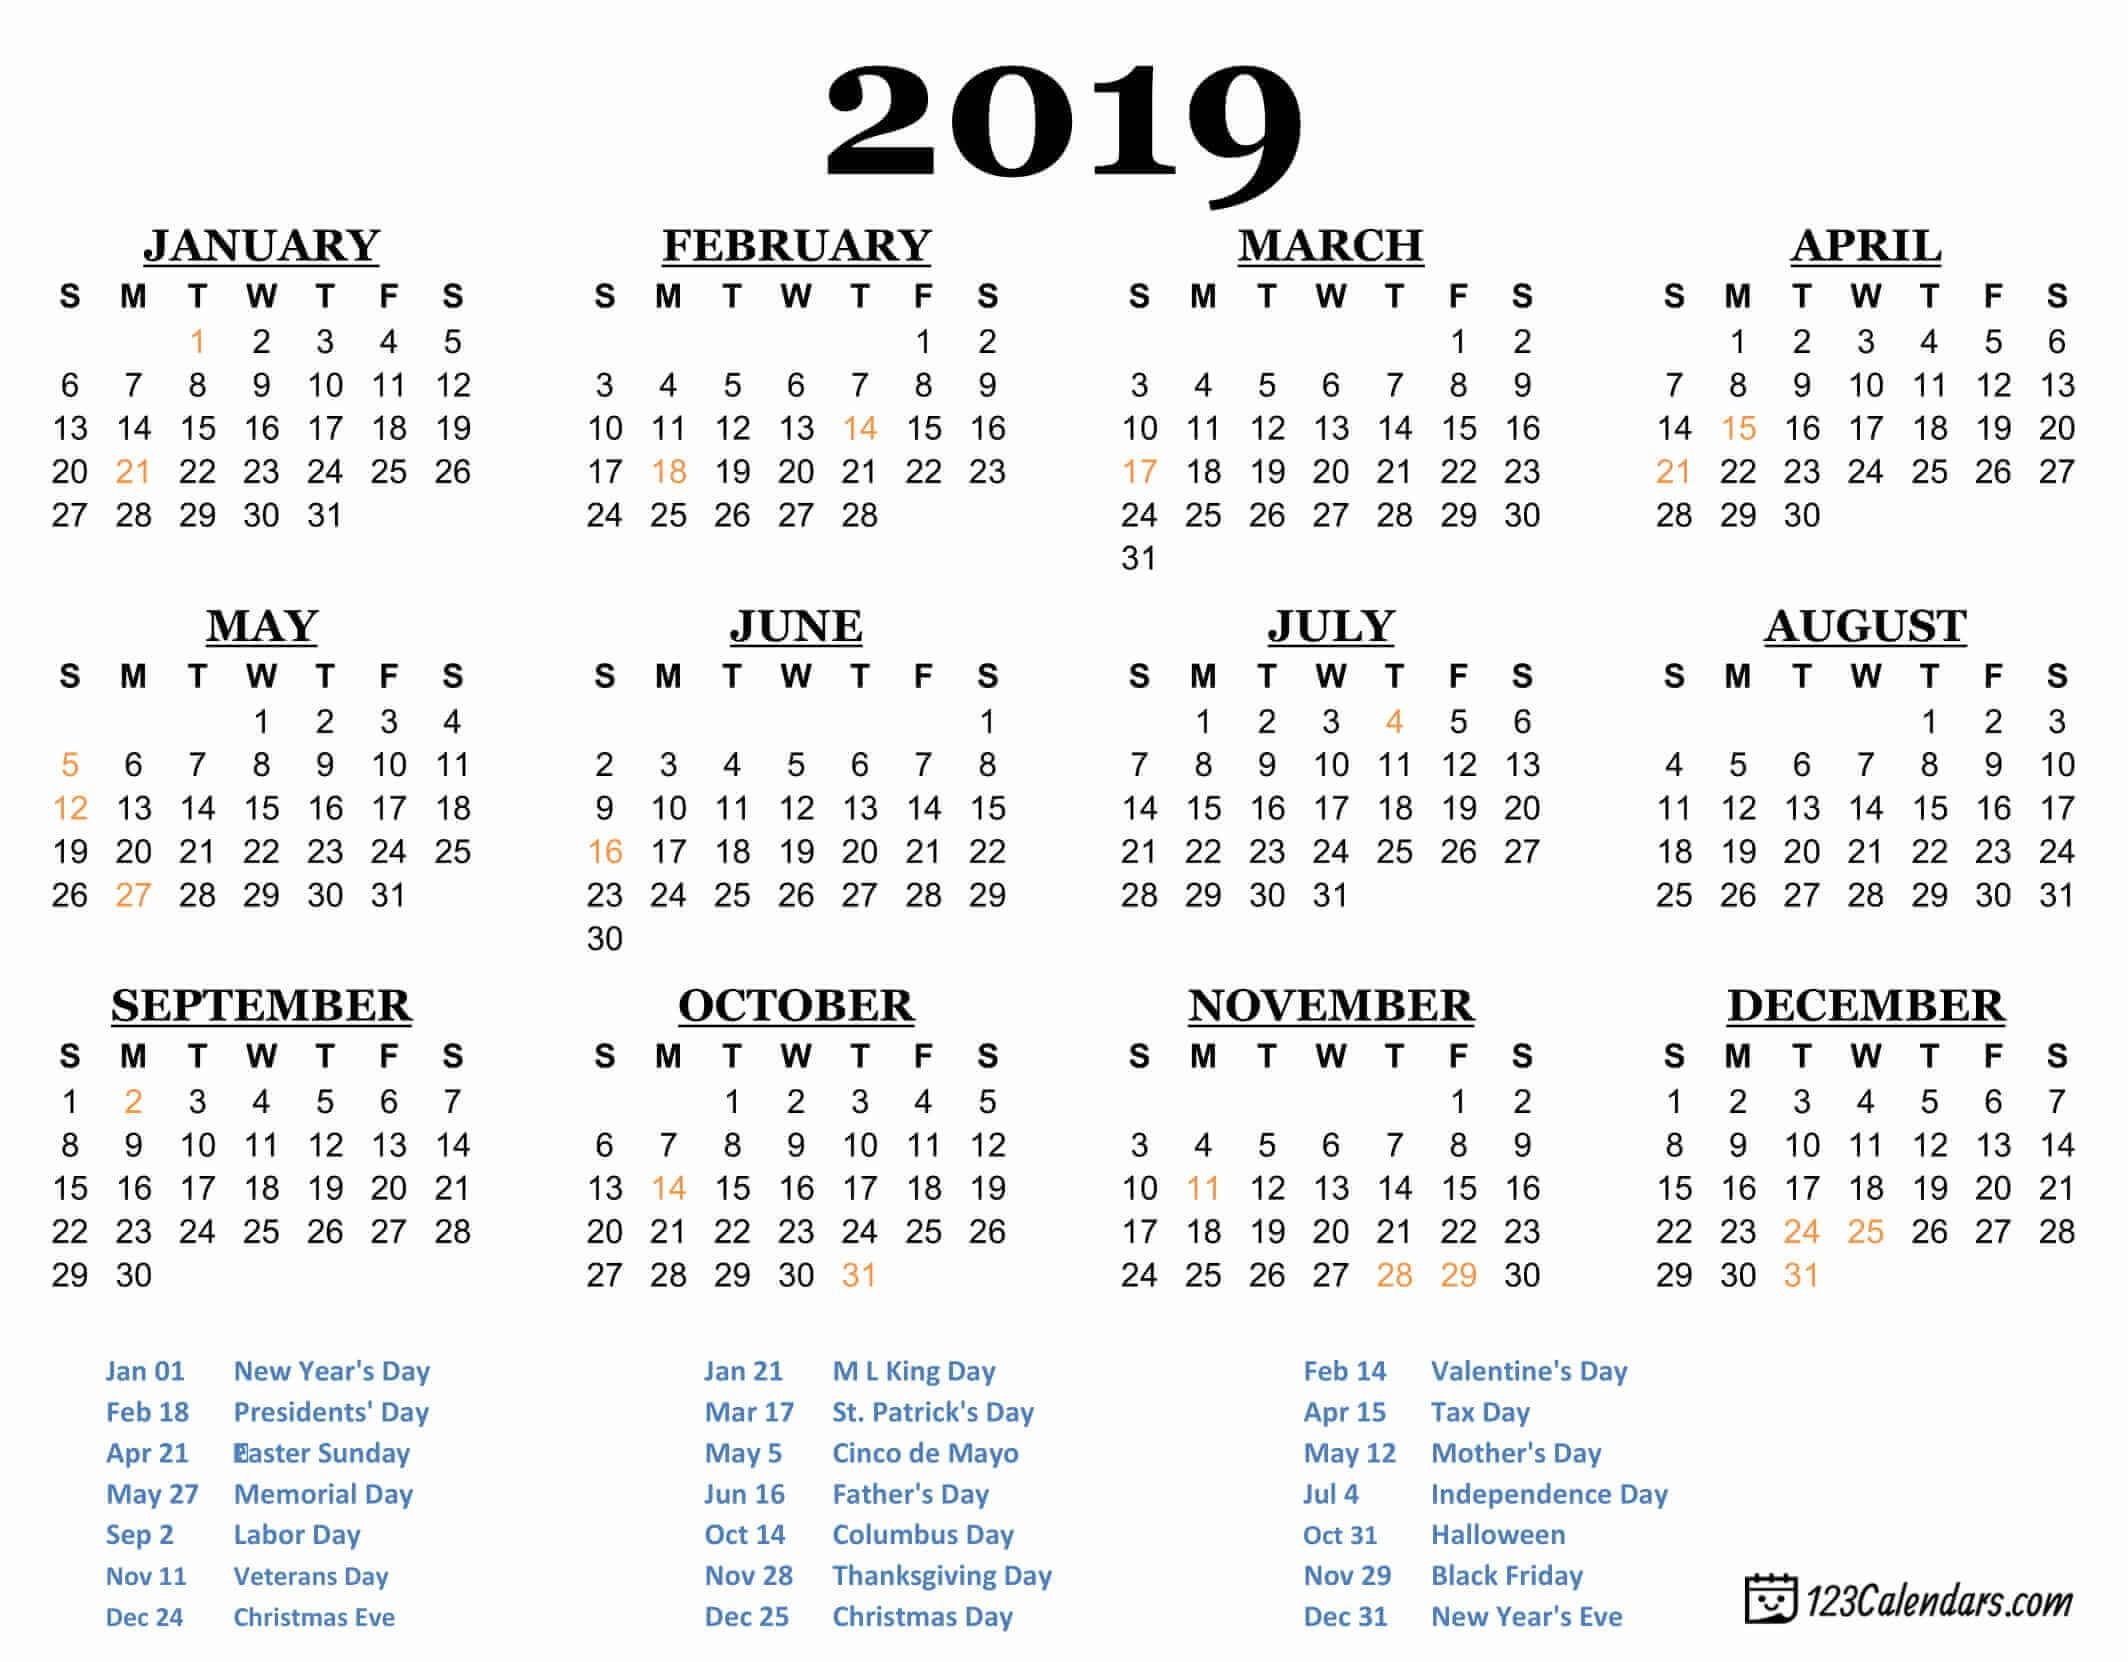 Year 2019 Printable Calendar Templates 123Calendars